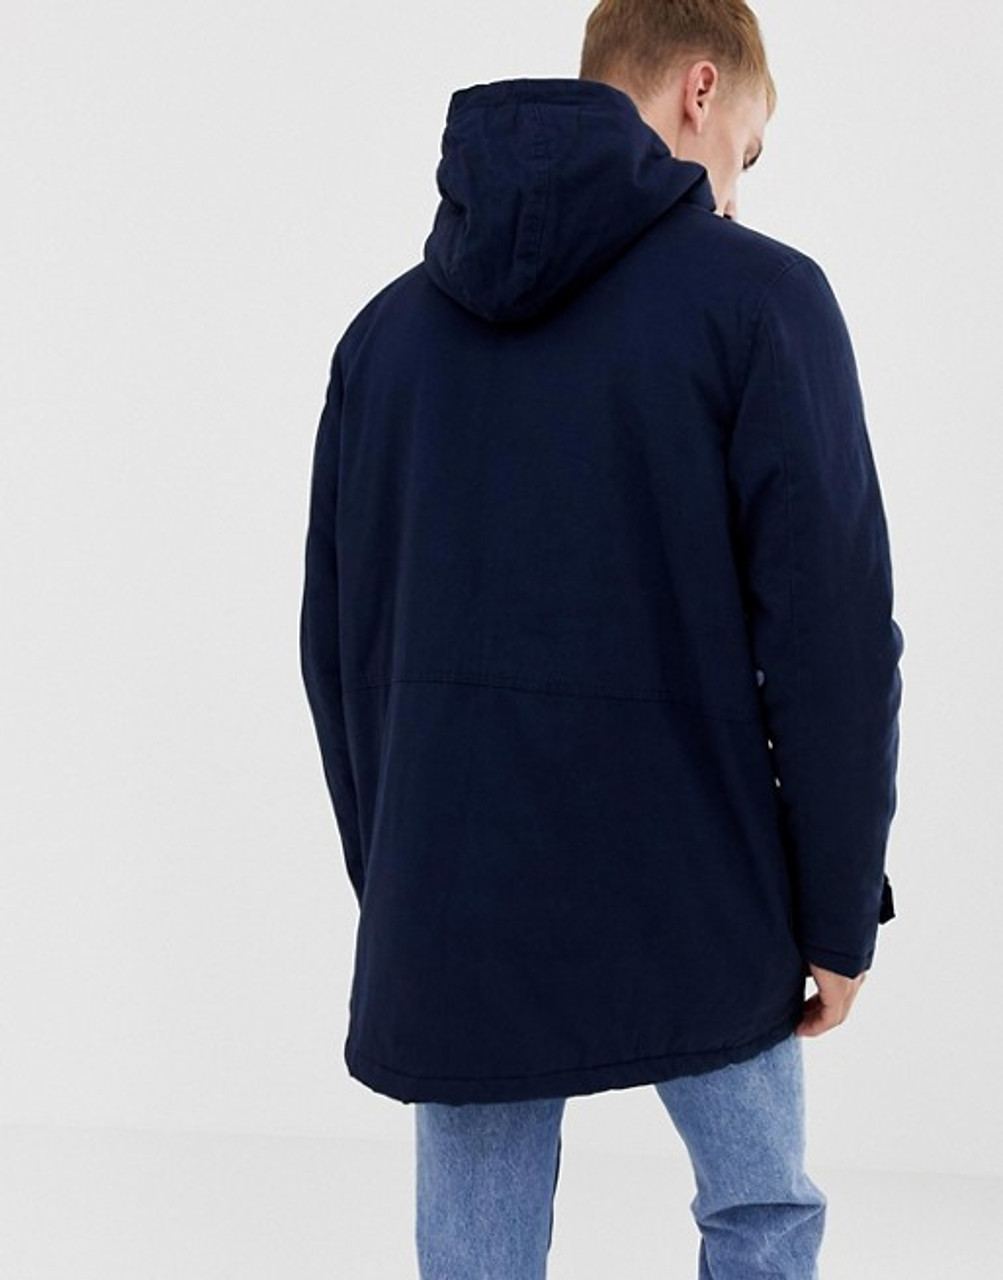 Borg Lined Hooded Parka Jacket